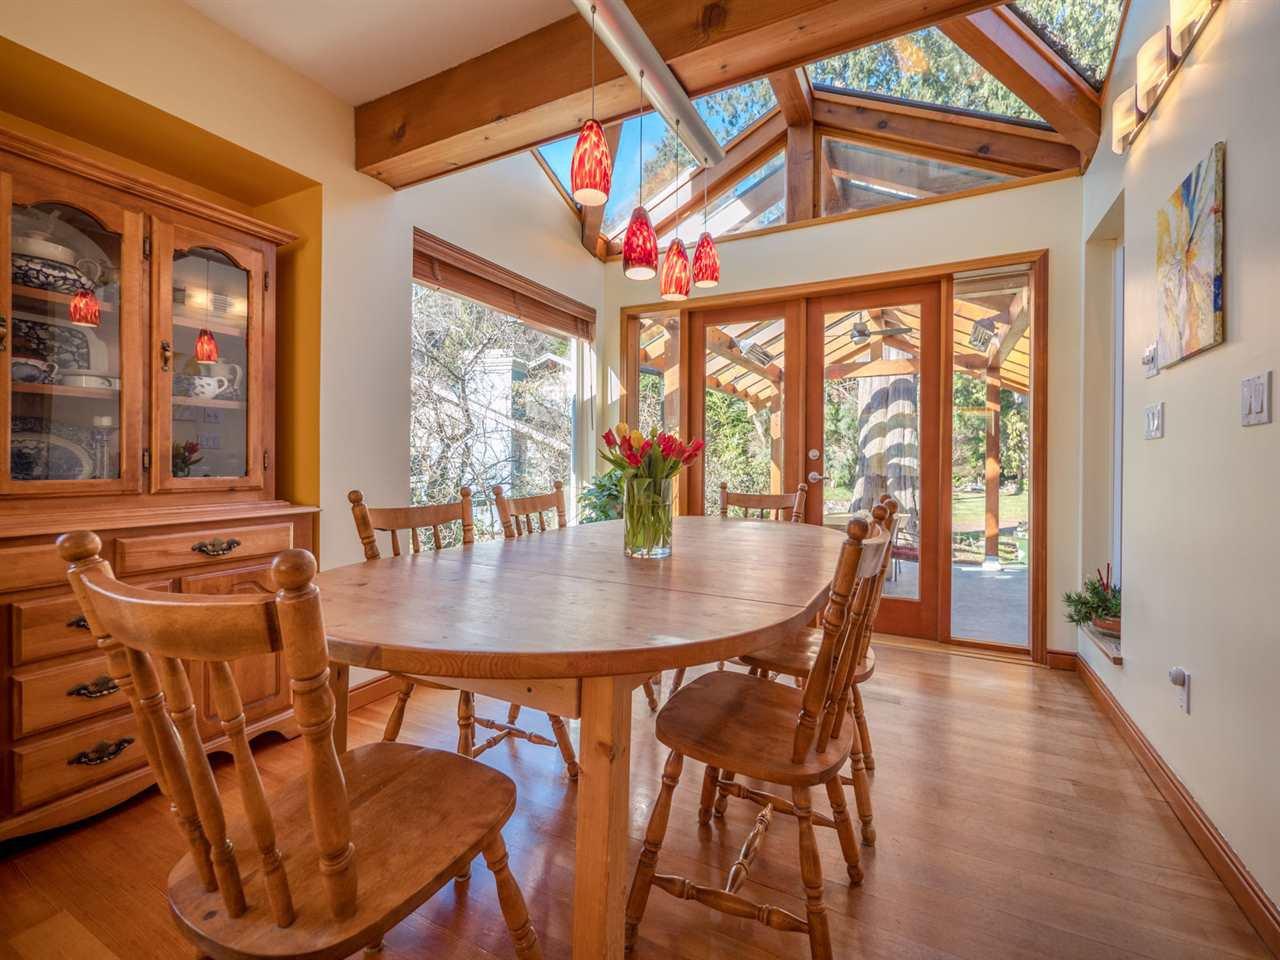 Photo 6: Photos: 3592 BEACH Avenue: Roberts Creek House for sale (Sunshine Coast)  : MLS®# R2244747